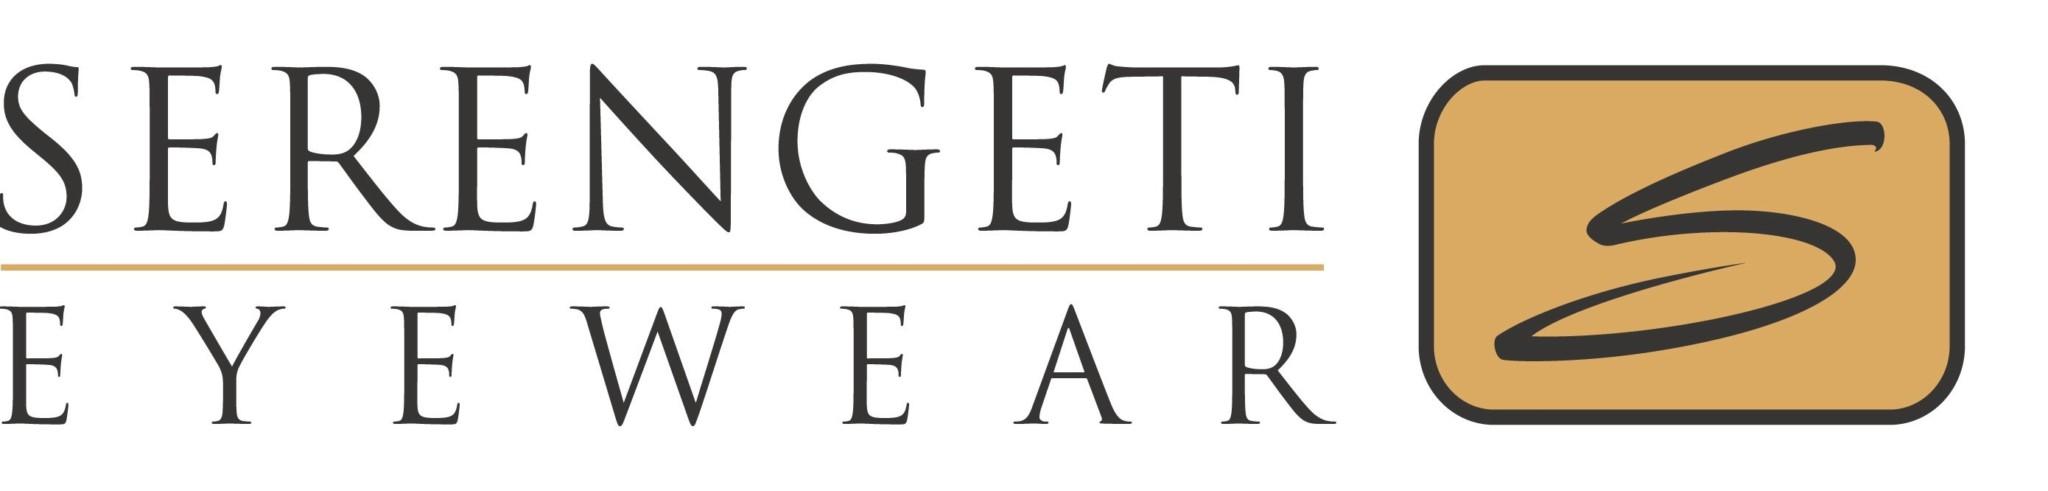 serengeti_prescrioption_sunglasses_logo